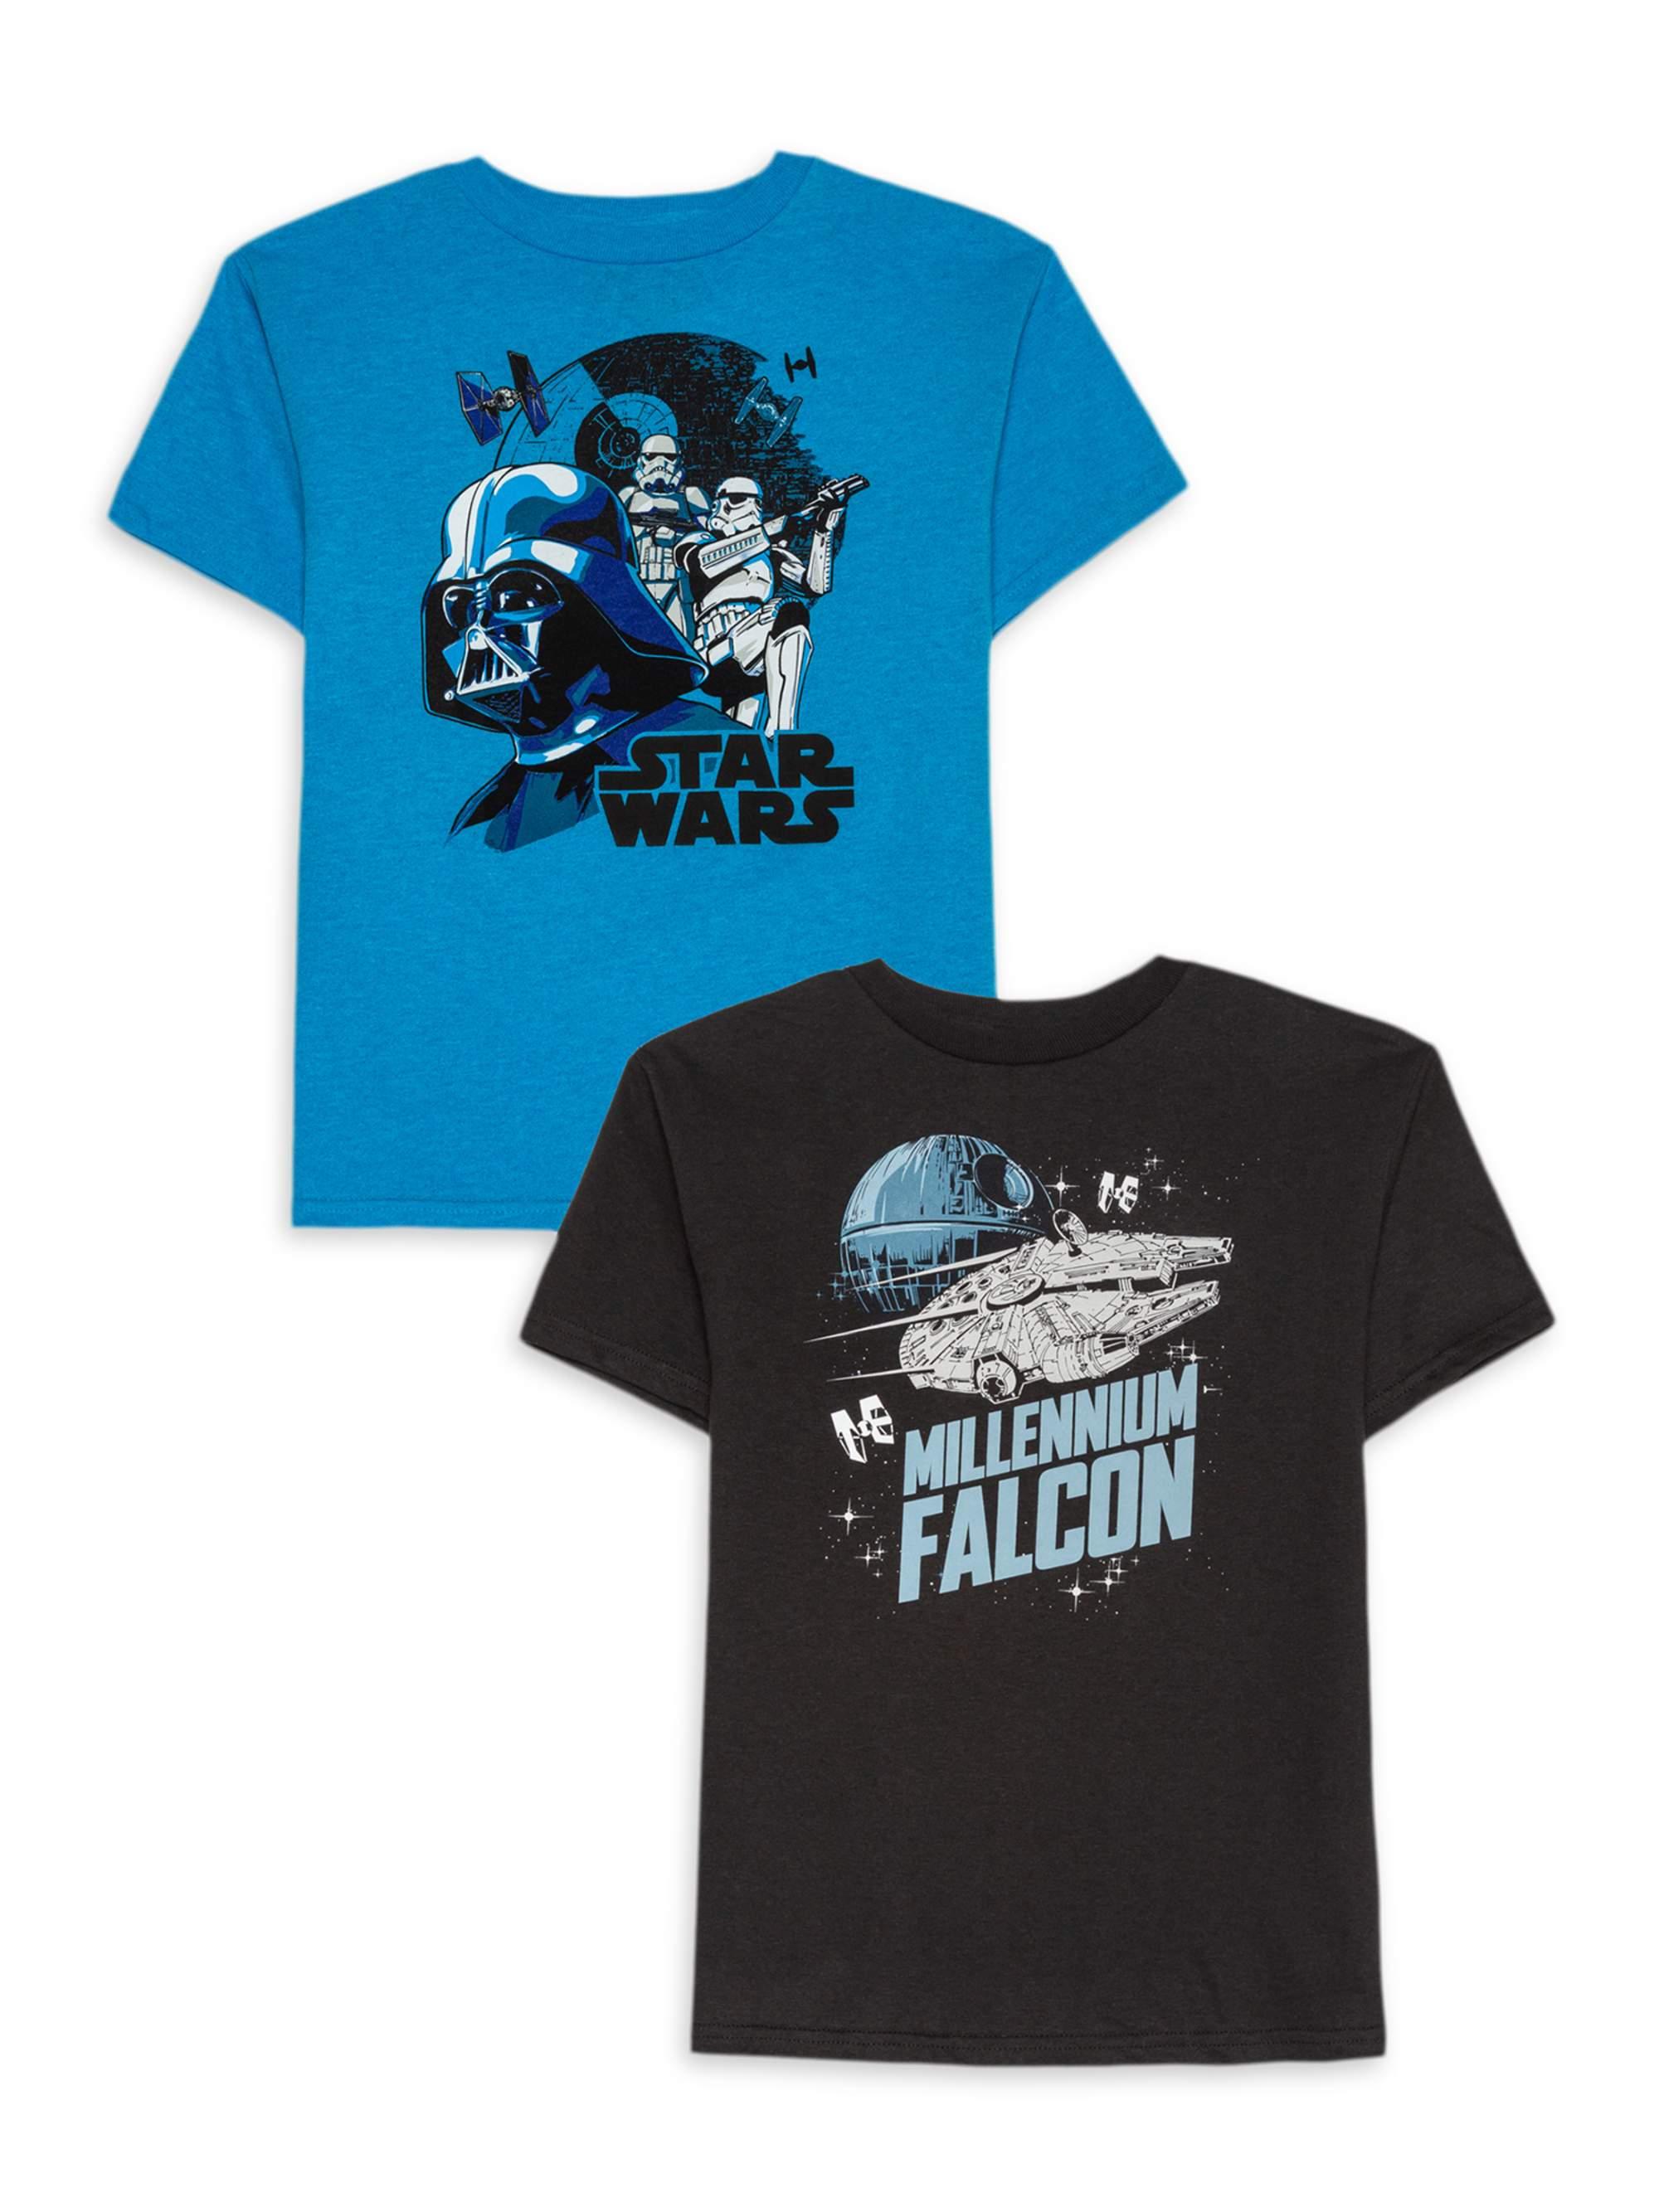 NEW Lucasfilm Star Wars The Force Awakens Boys Pajama Shirt Pants Set size 4 6